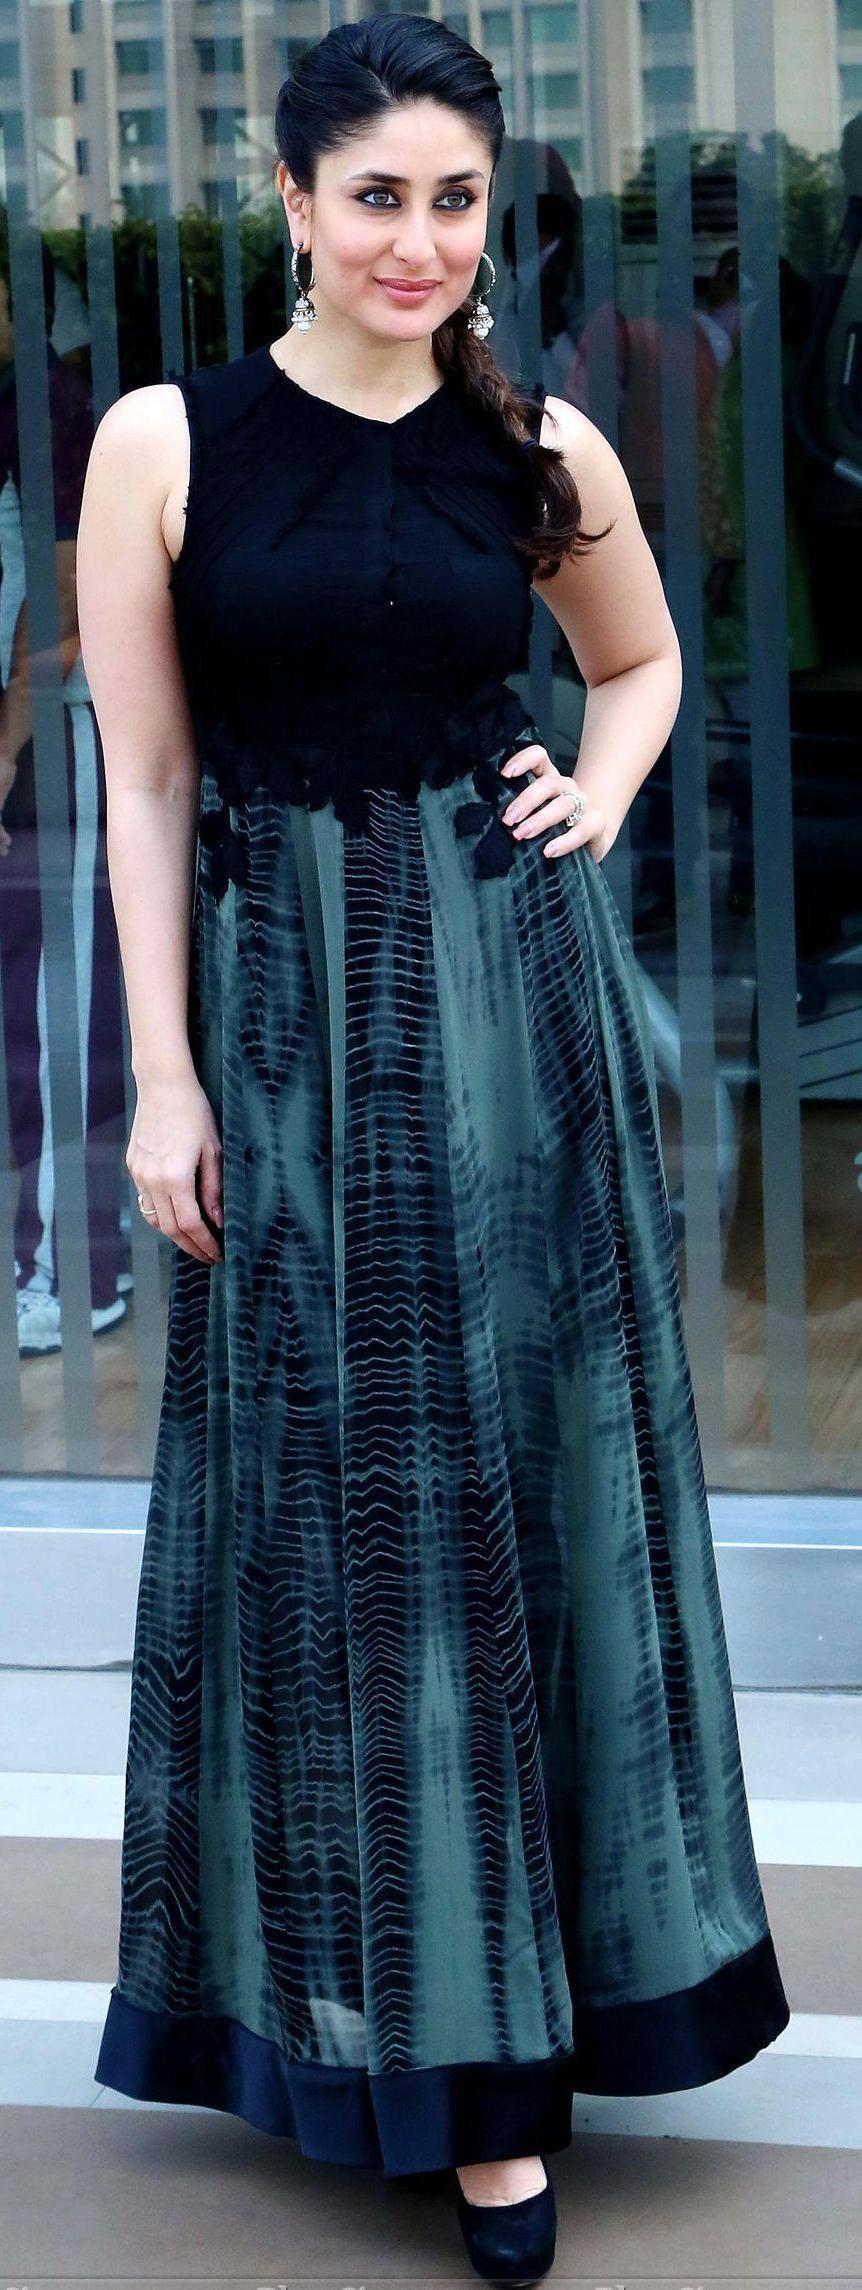 Kareena kapoor in an elegant dress chudidar pinterest kareena